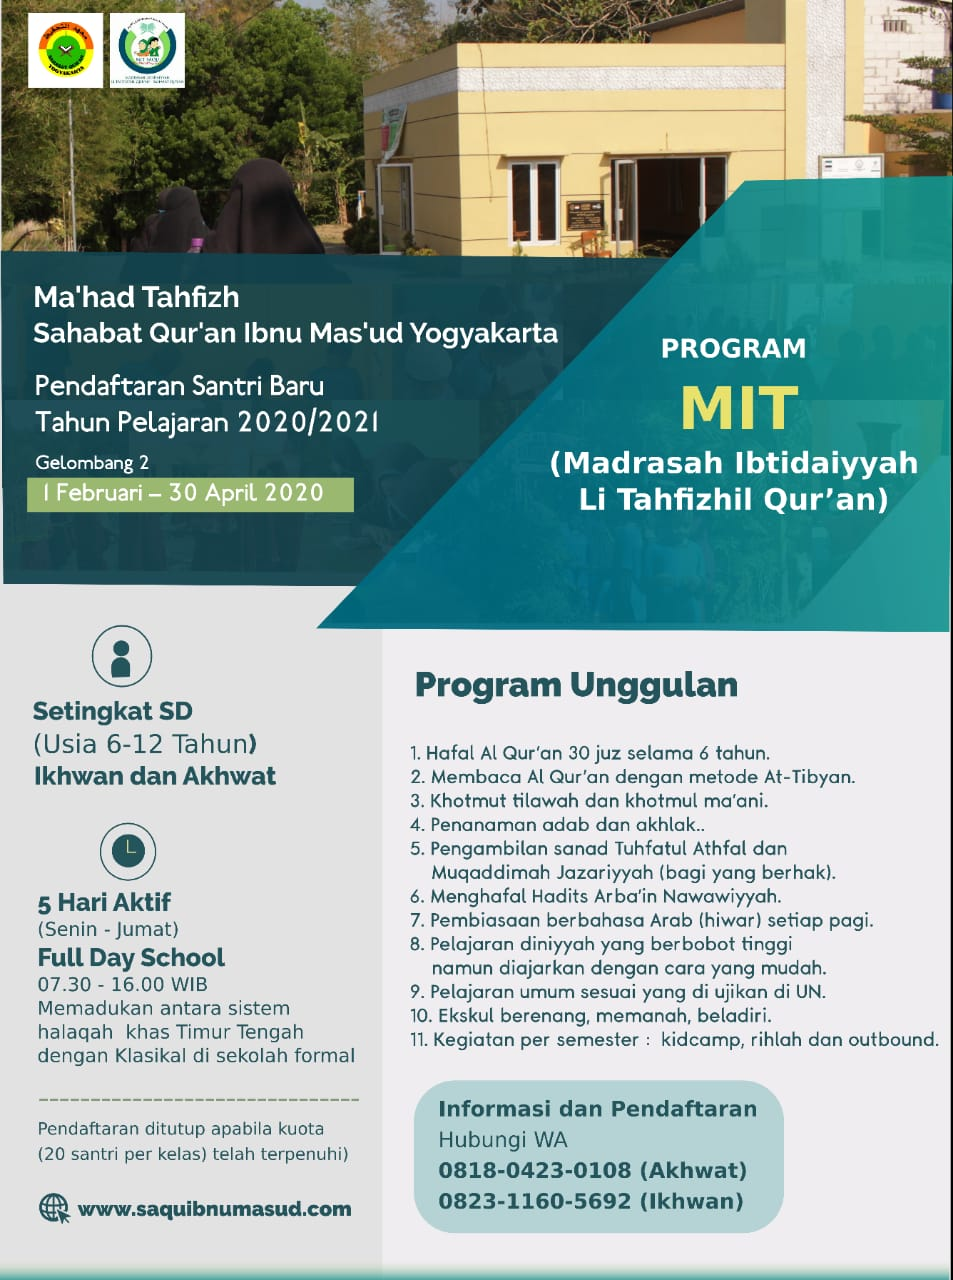 Brosur dan Flyer PPDB 21/22 - Sahabat Quran Ibnu Mas'ud